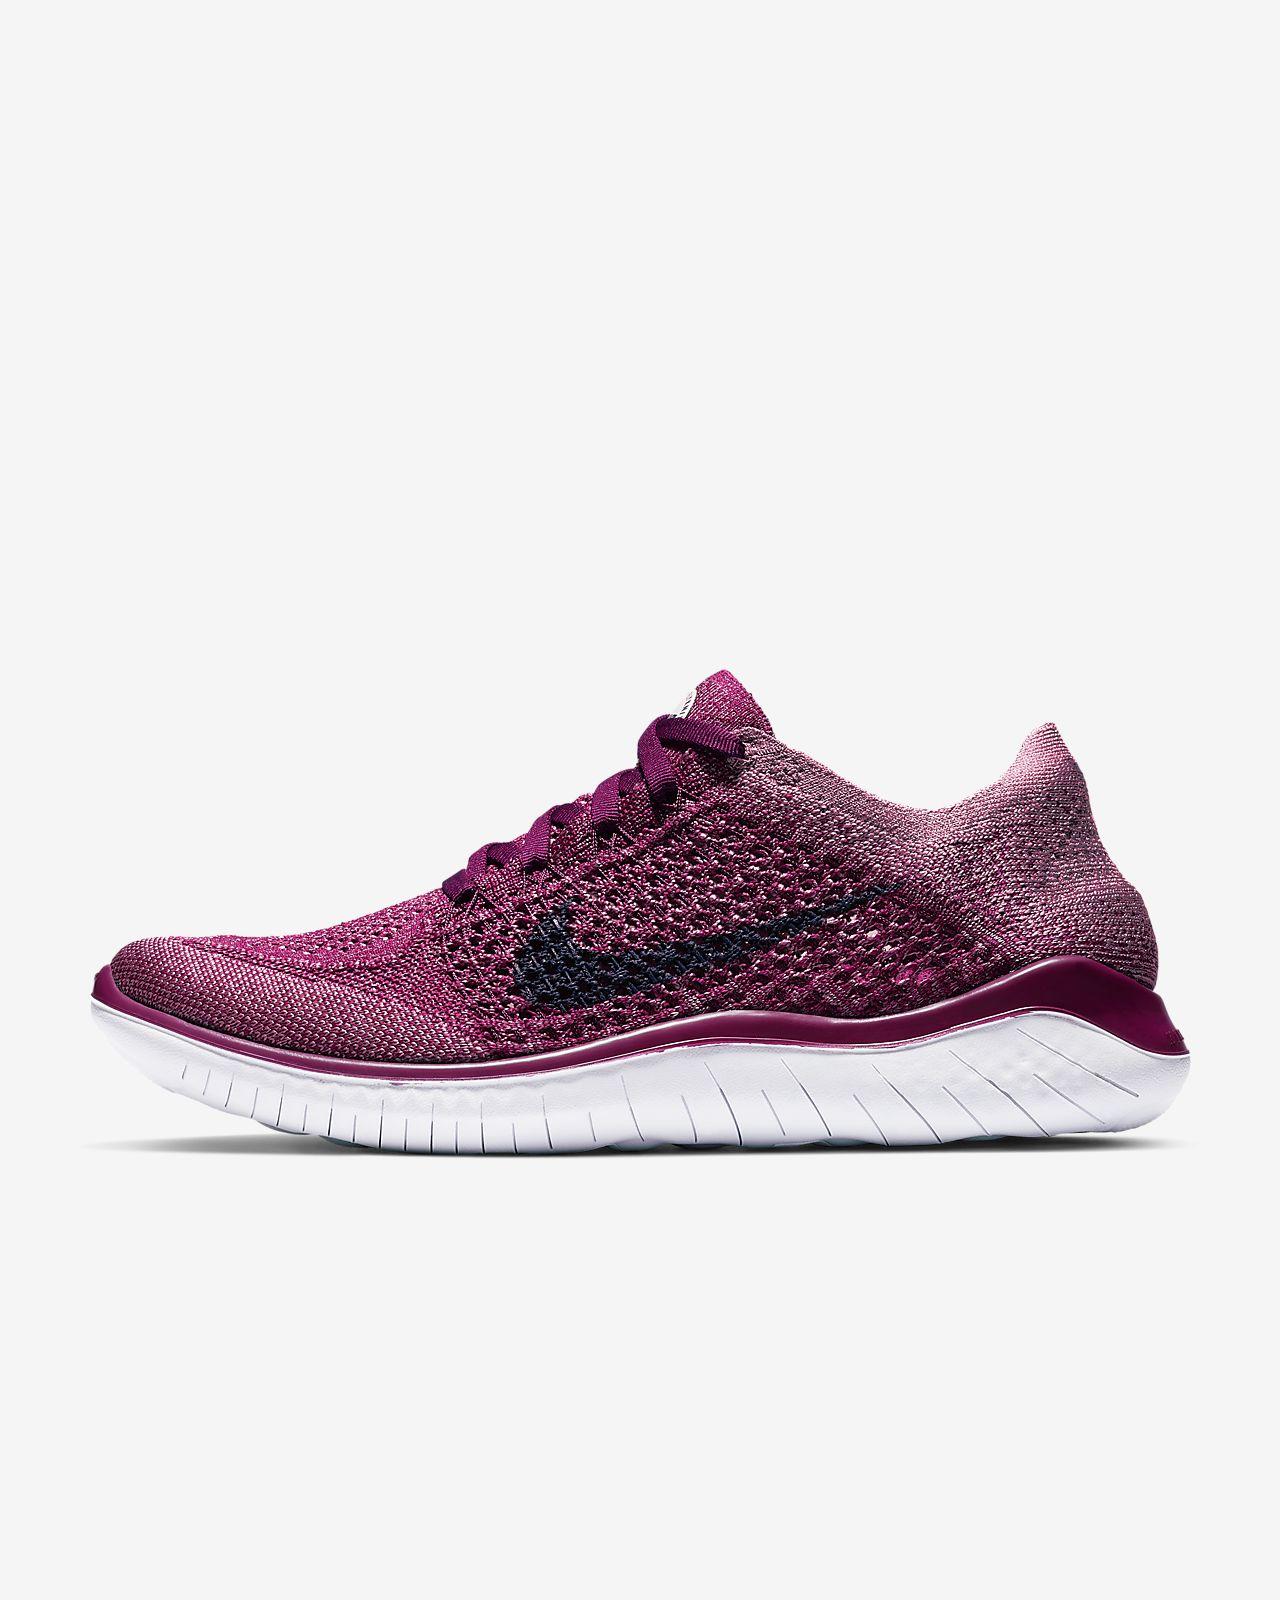 NIKE Official]Nike Free RN Flyknit 2018